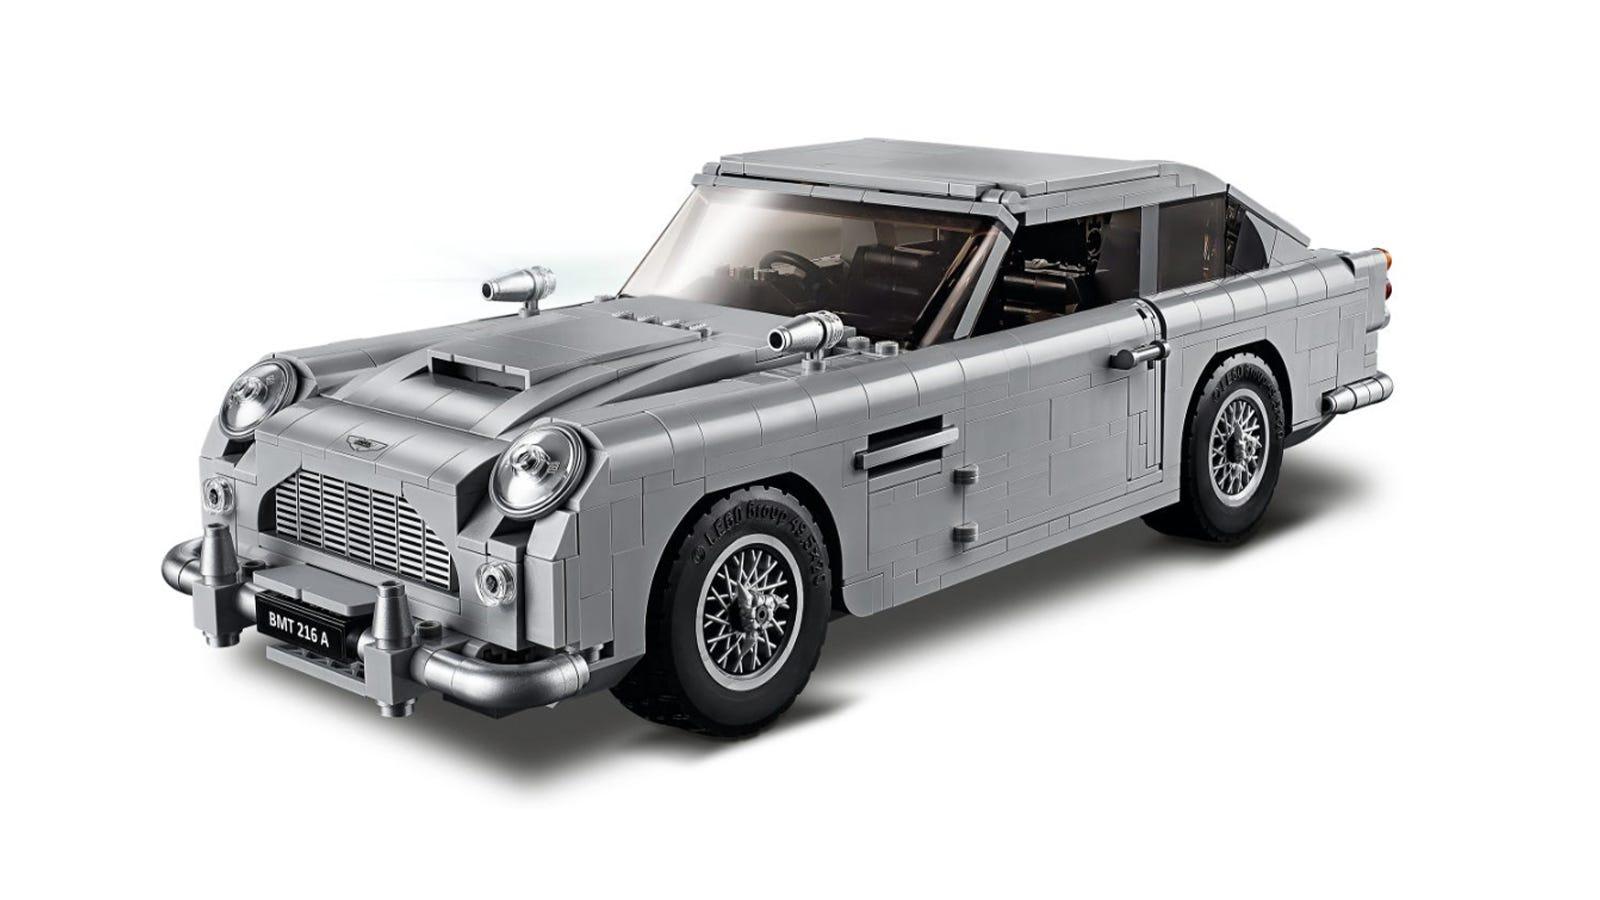 LEGO James Bond Astron Martin